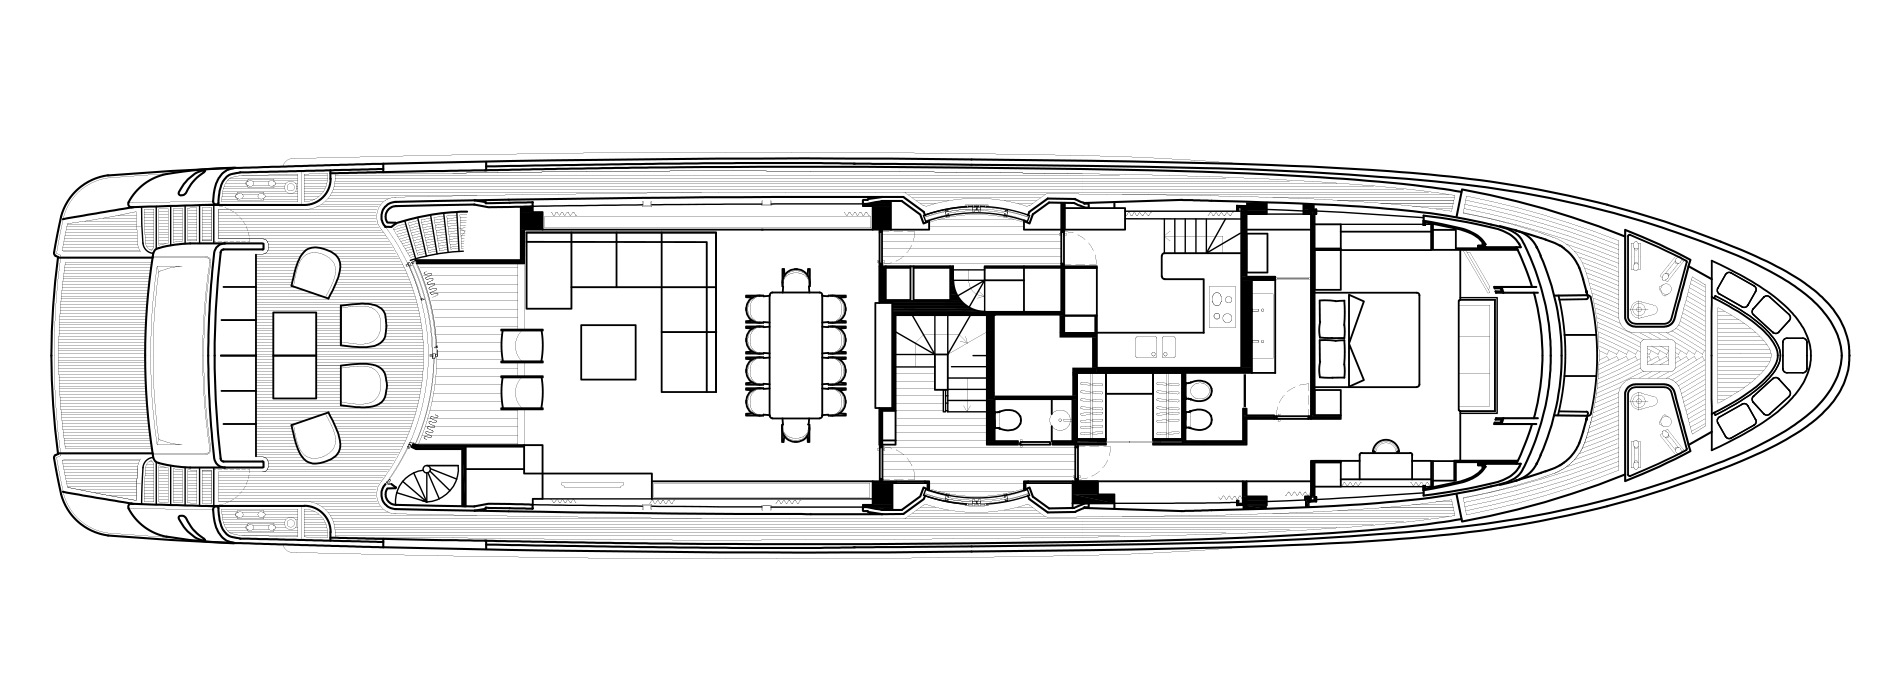 Sanlorenzo Yachts SD112 Main deck Versione A